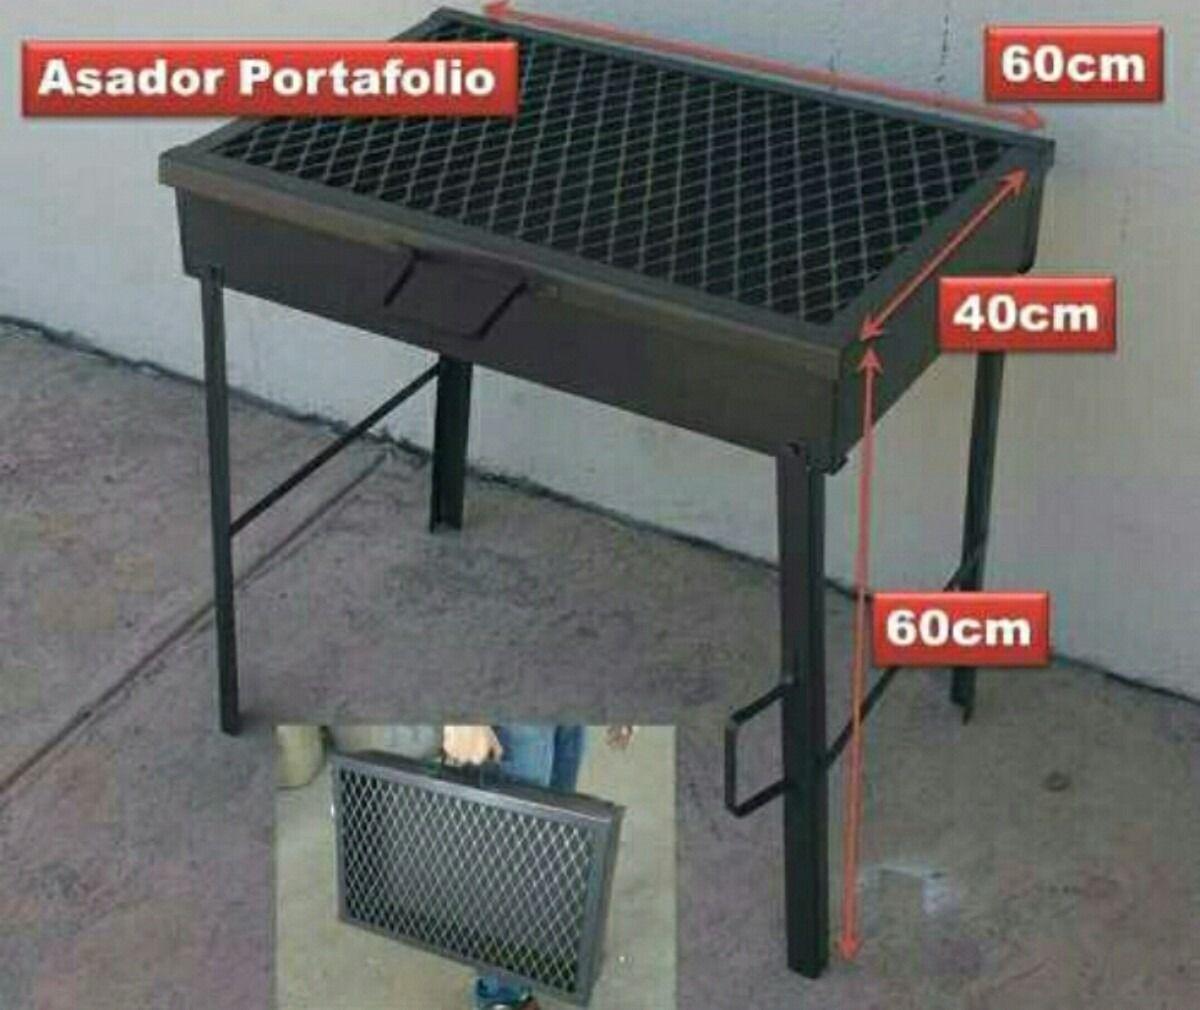 Asador Portafolio -   600.00 en MercadoLibre  8077d441942